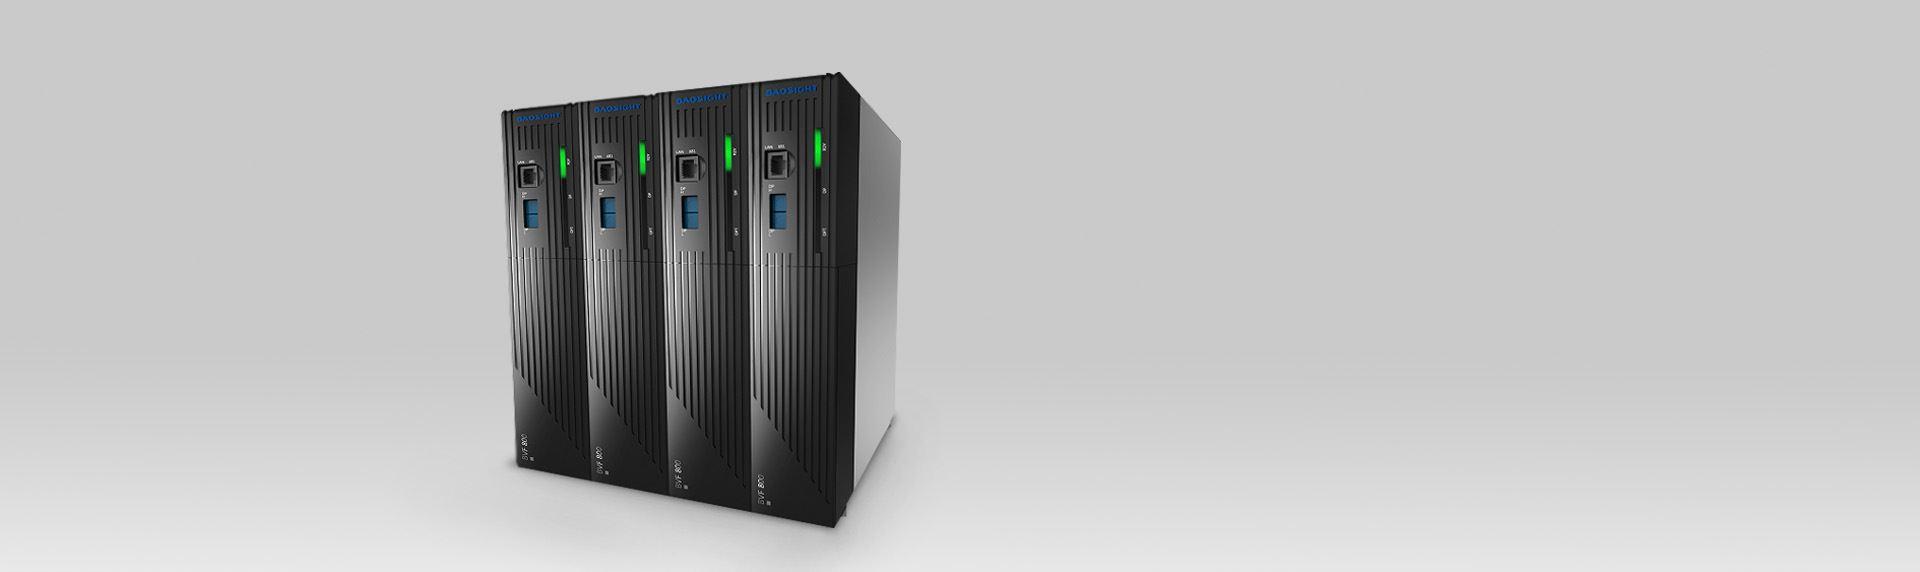 SSC设计-控制终端机箱 工业设计